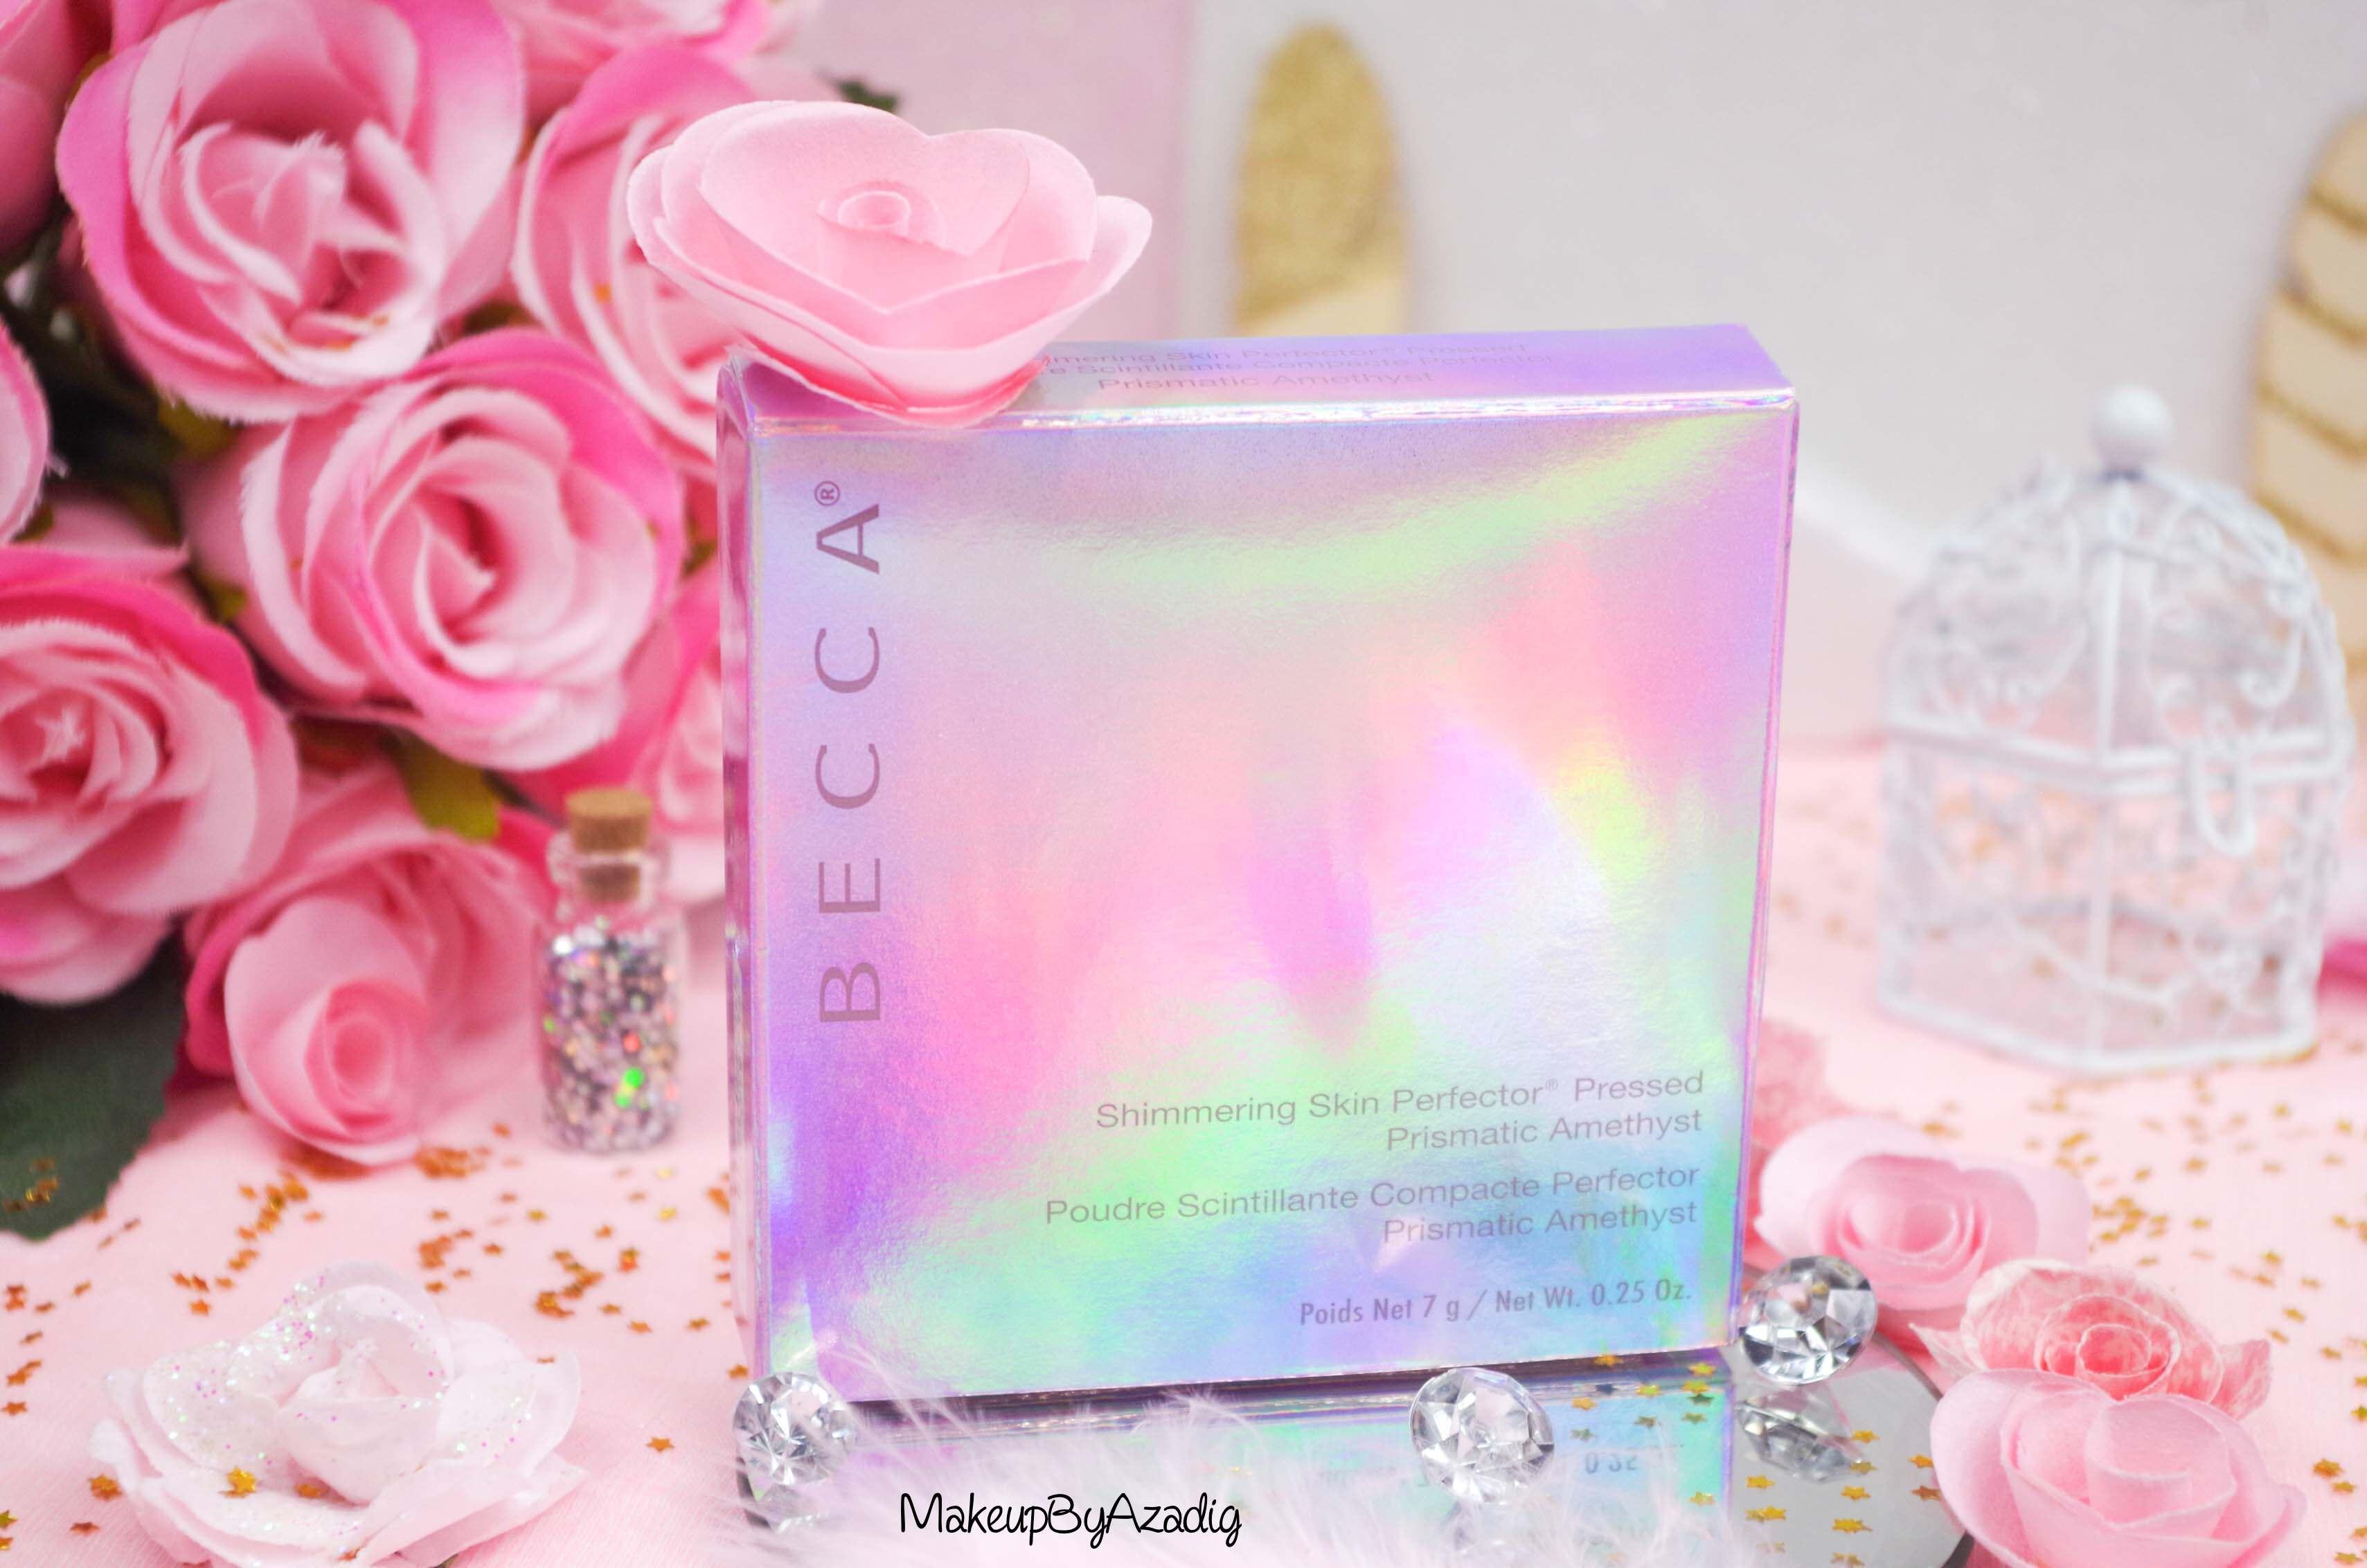 revue-becca-shimmering-skin-perfector-pressed-highlighter-enlumineur-violet-prismatic-amethyst-avis-swatch-prix-makeupbyazadig-packaging